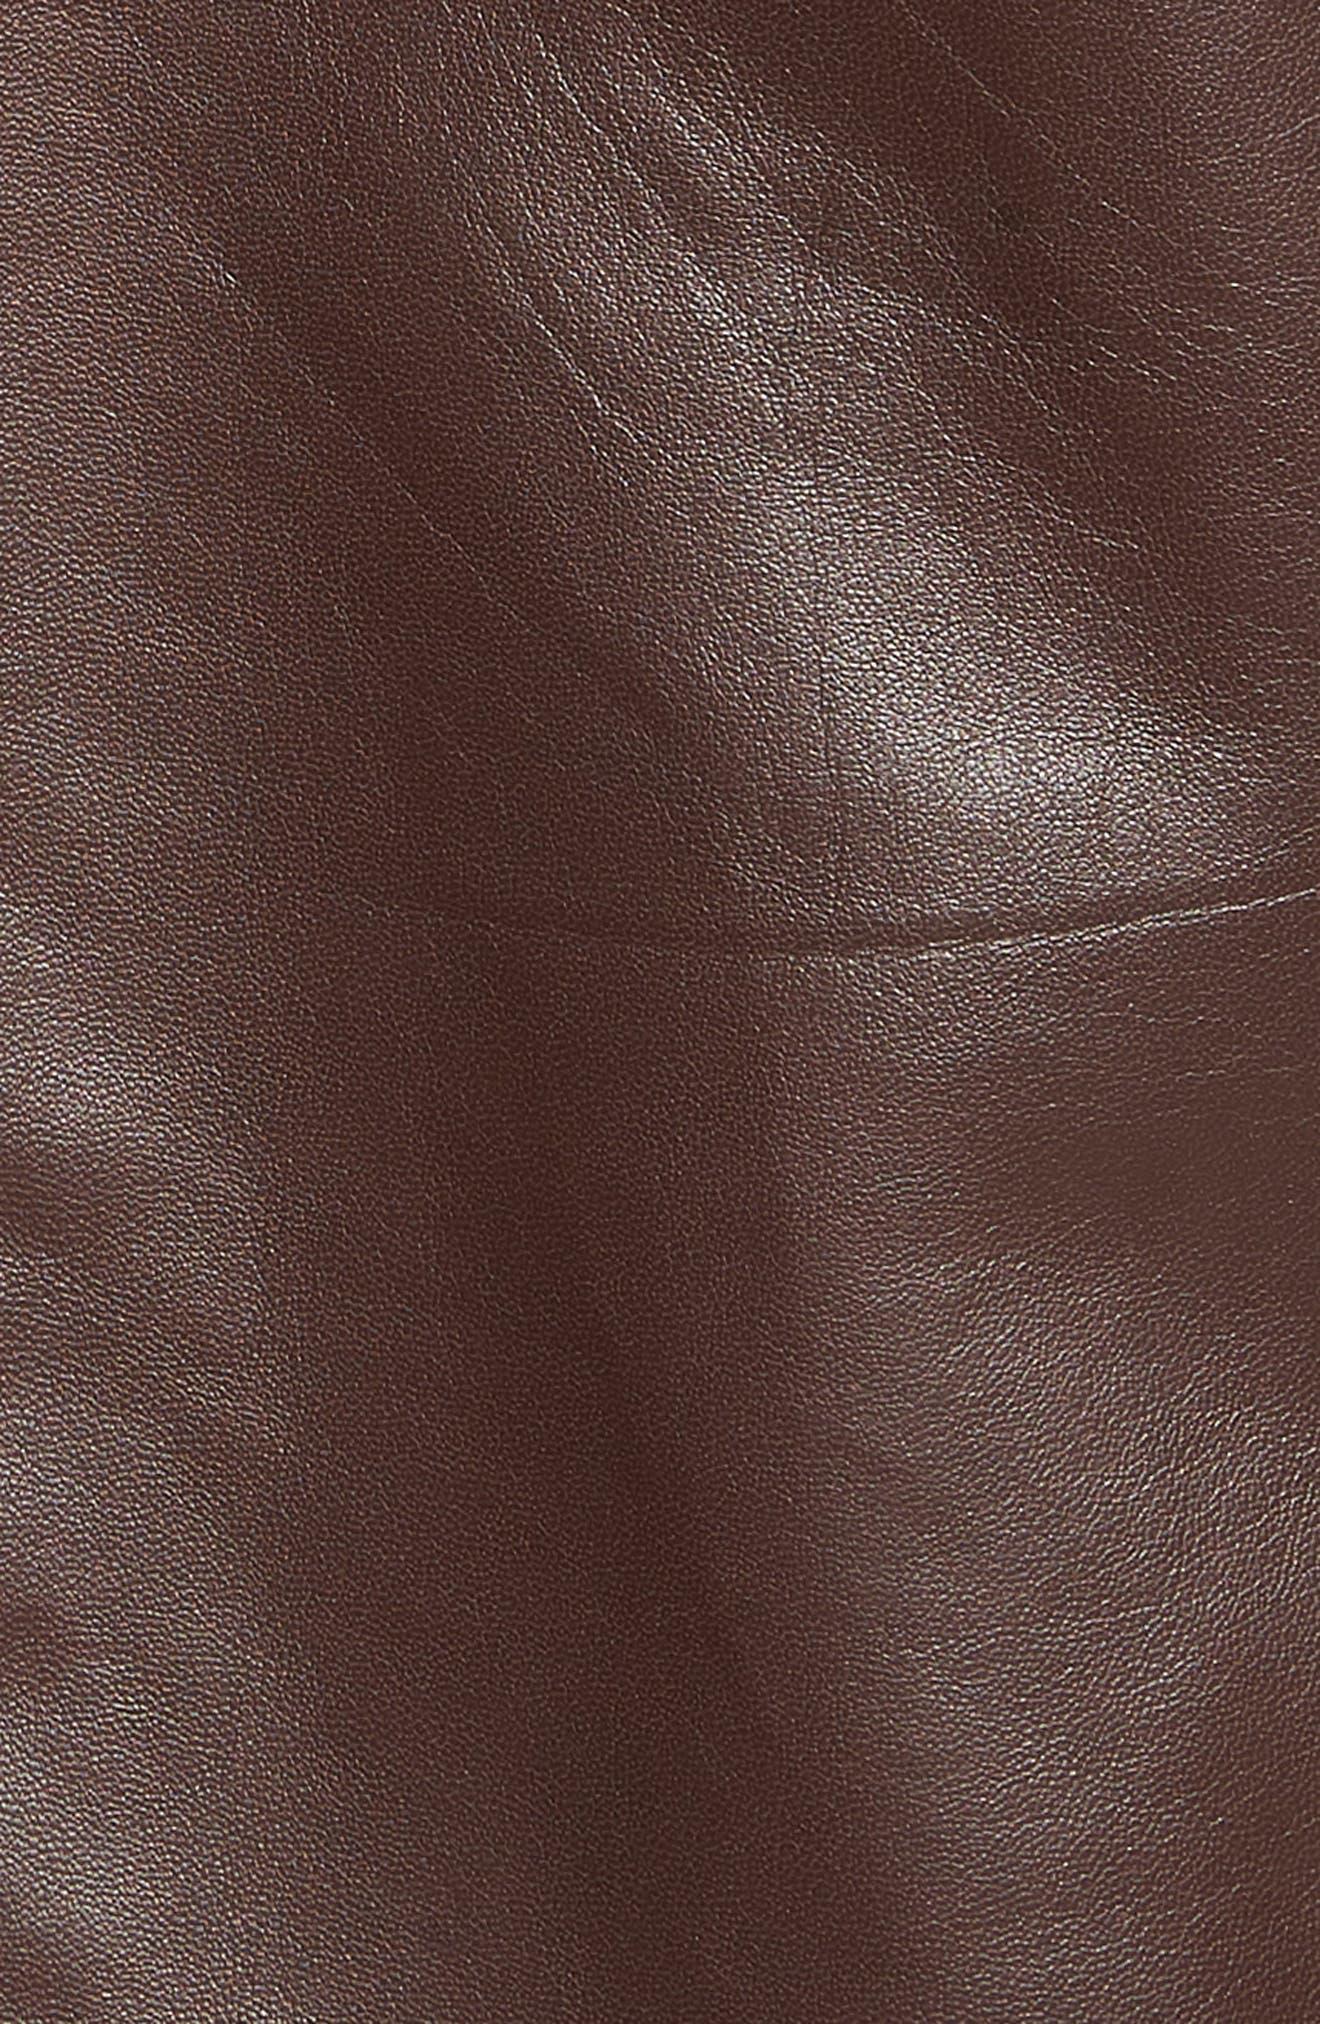 GOLDEN BEAR,                             The Bartlett Leather Jacket,                             Alternate thumbnail 7, color,                             DARK BROWN